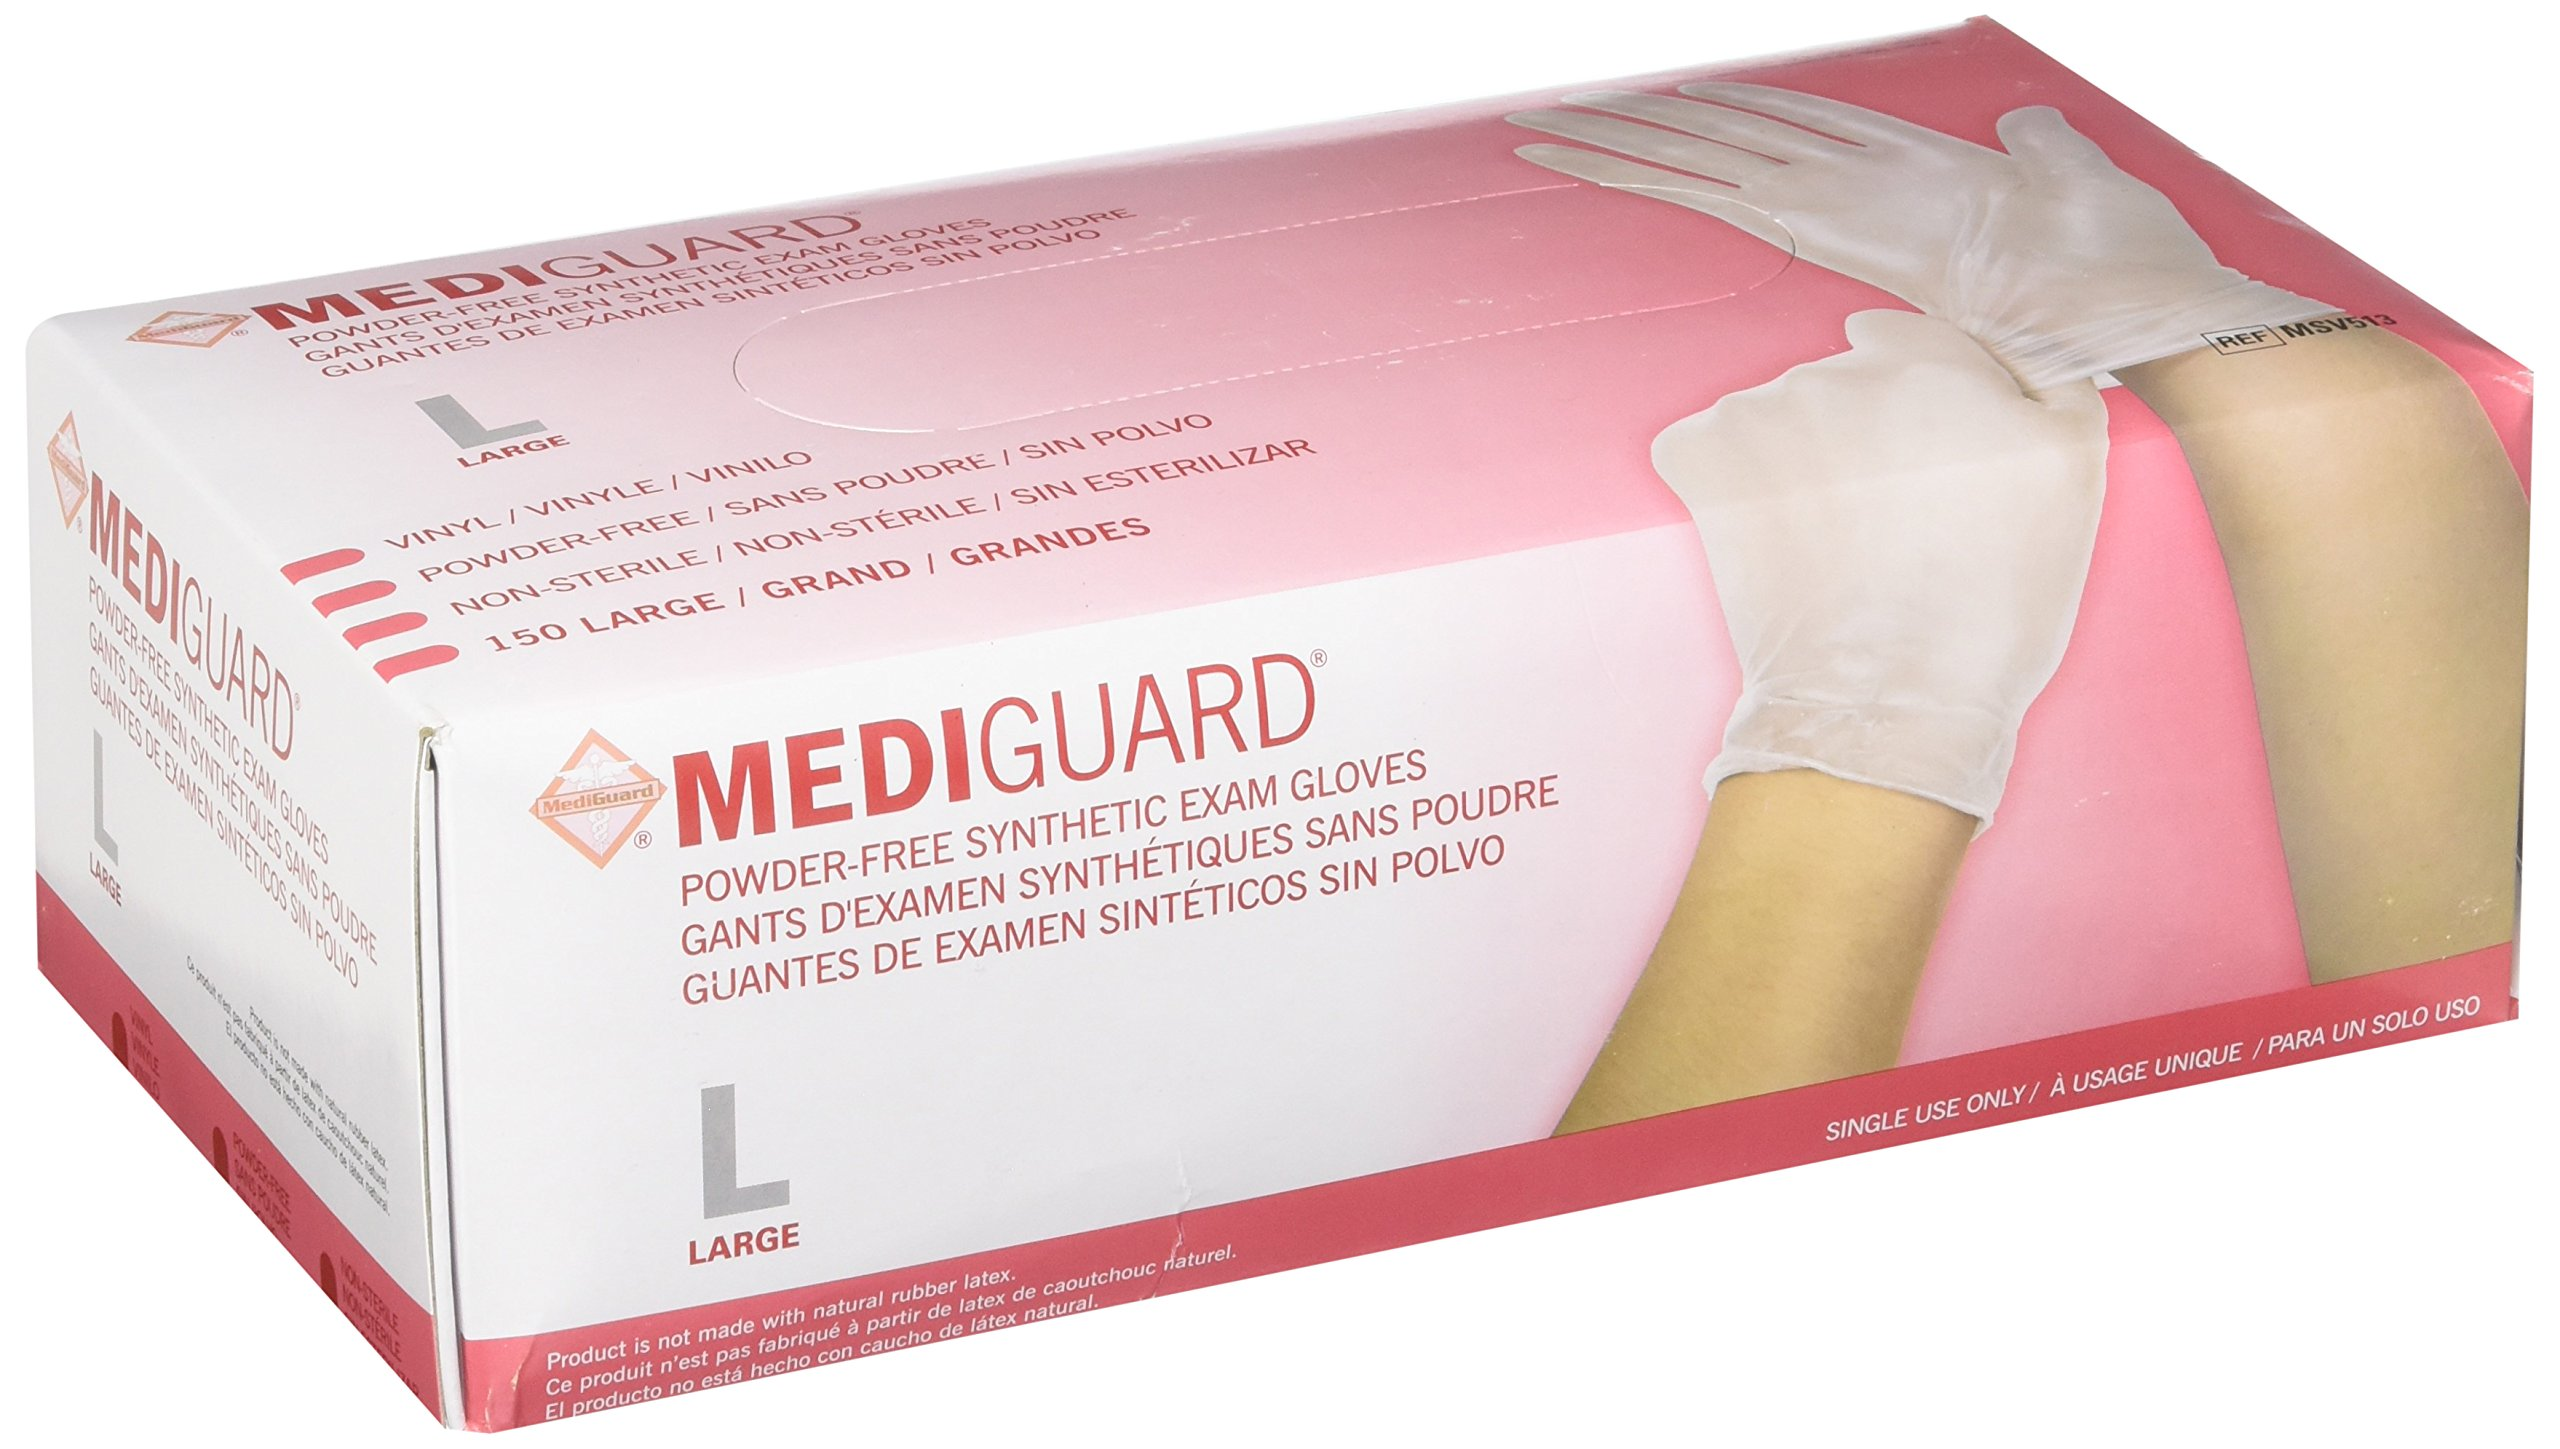 MediGuard Vinyl Synthetic Exam Gloves Size: Large by Medline (Image #1)